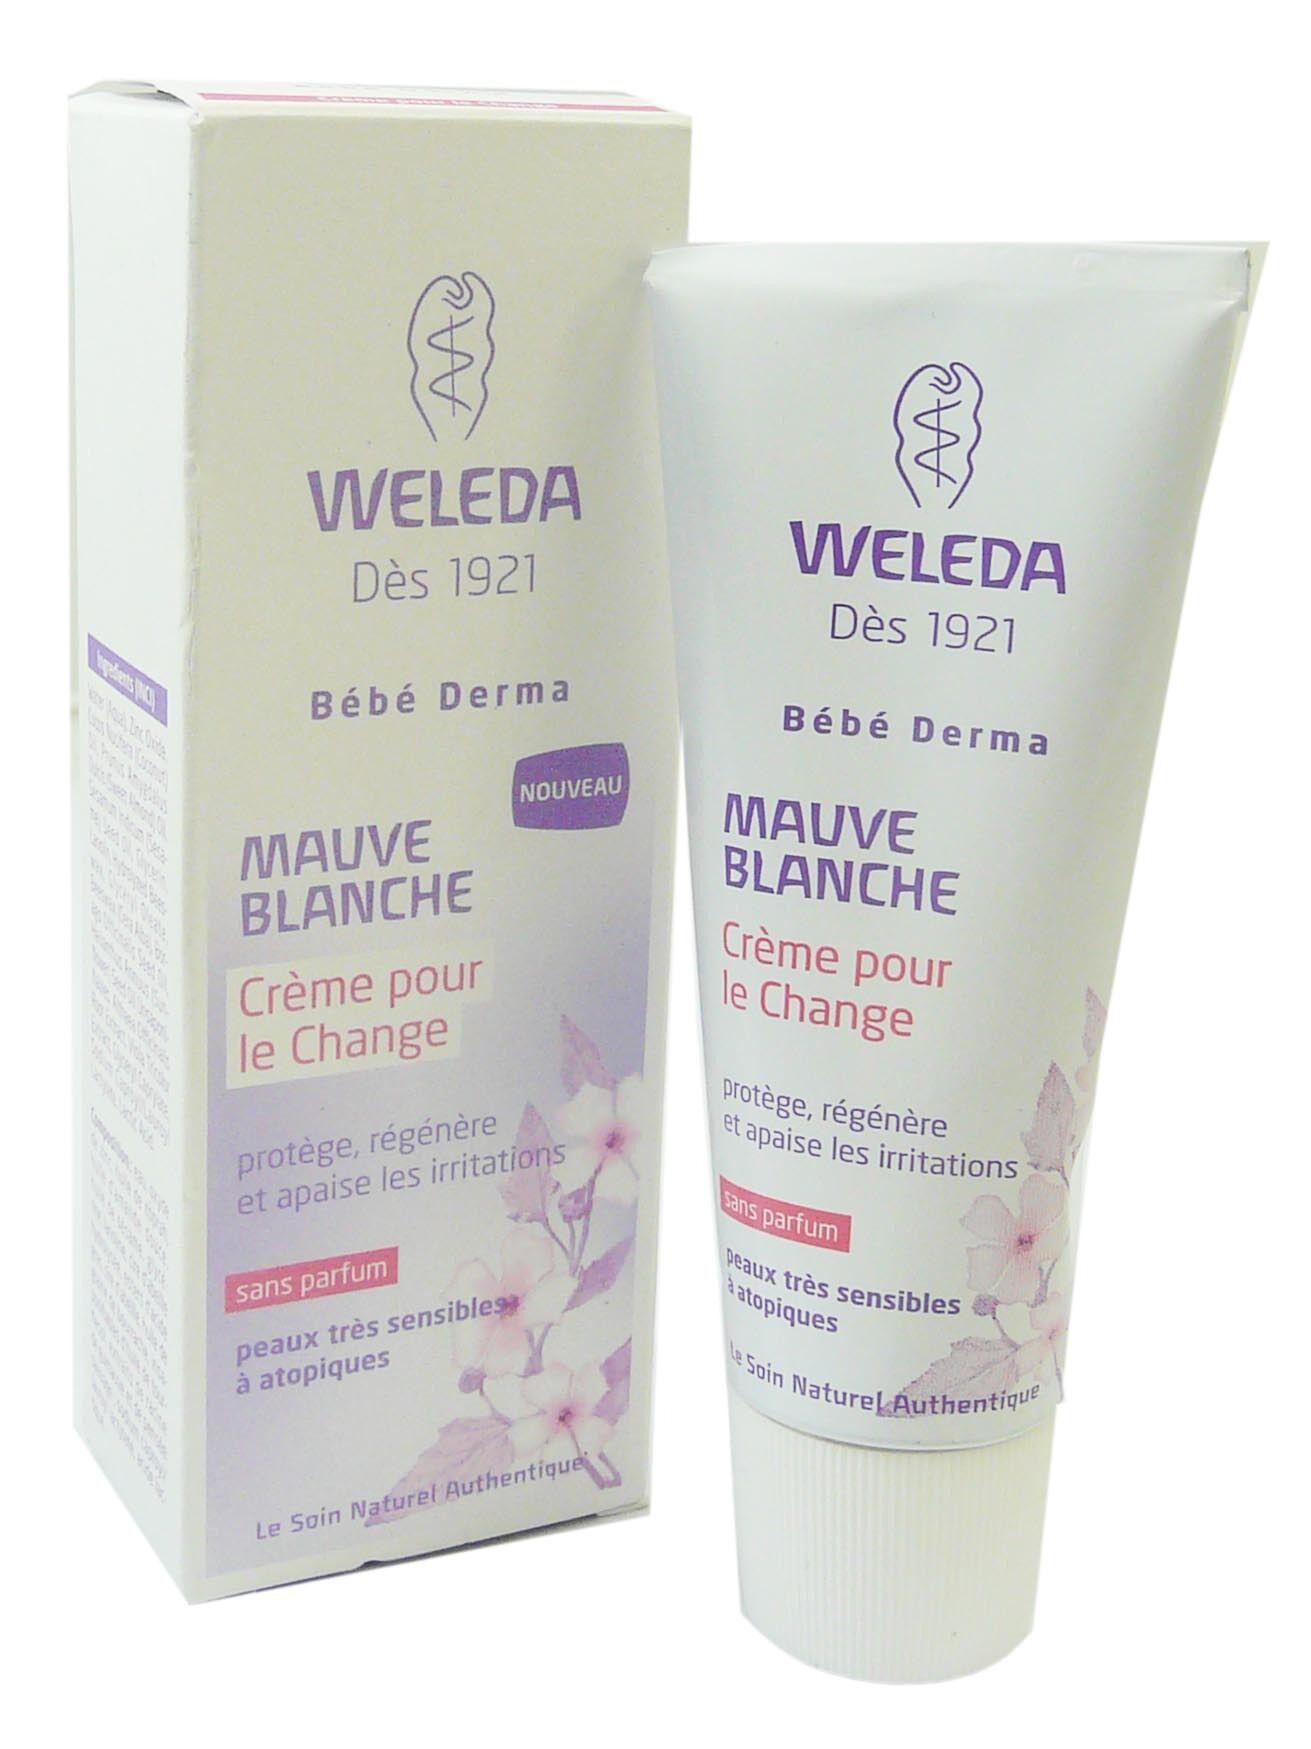 Weleda bb berma mauve blanche creme pour le change 50ml